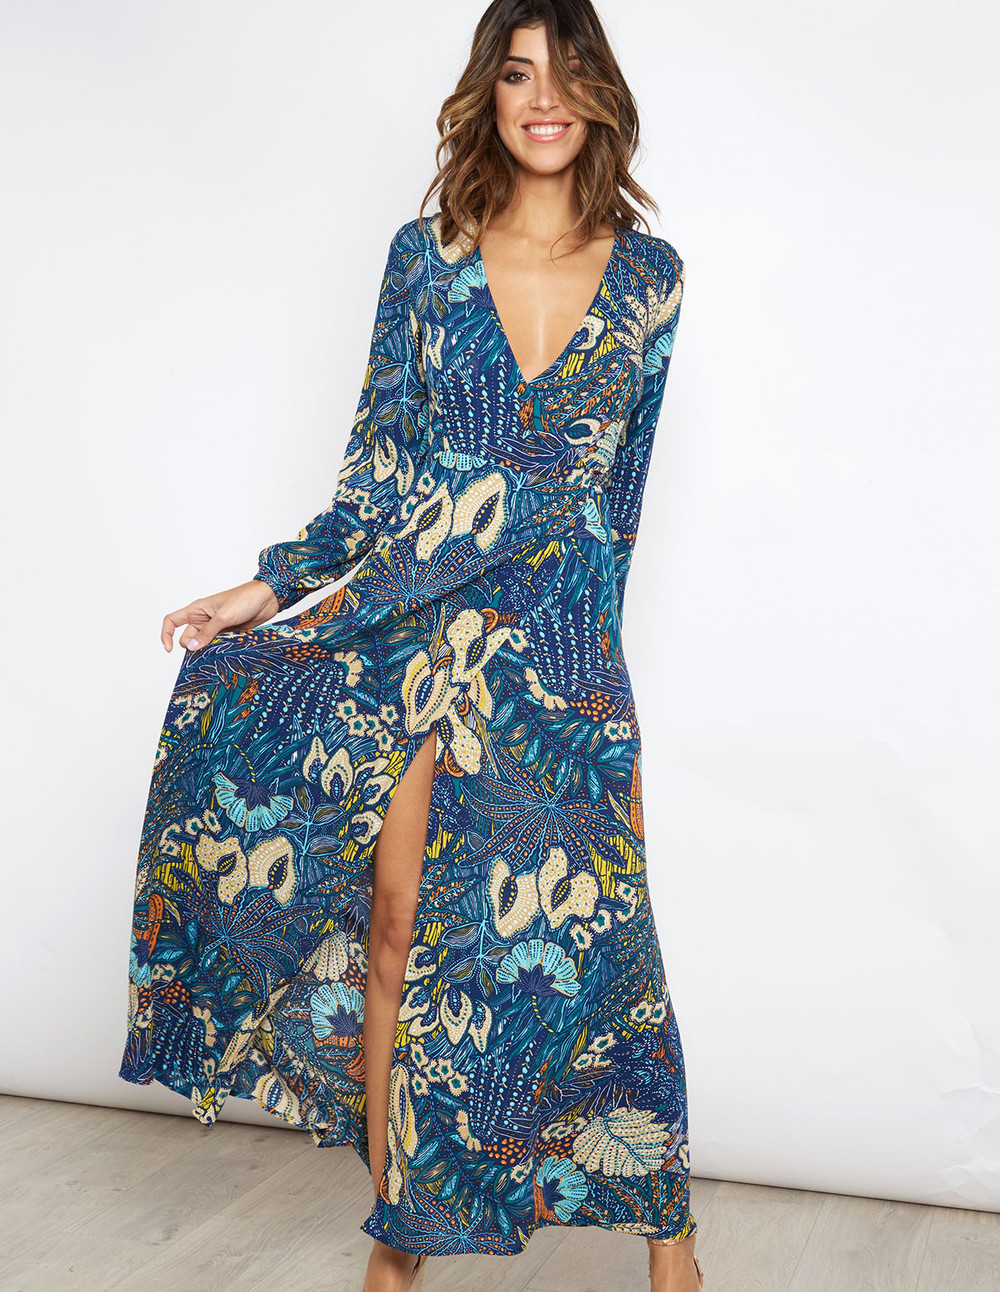 Blue Vanilla CARY - Wrap Printed Maxi Dress in navy